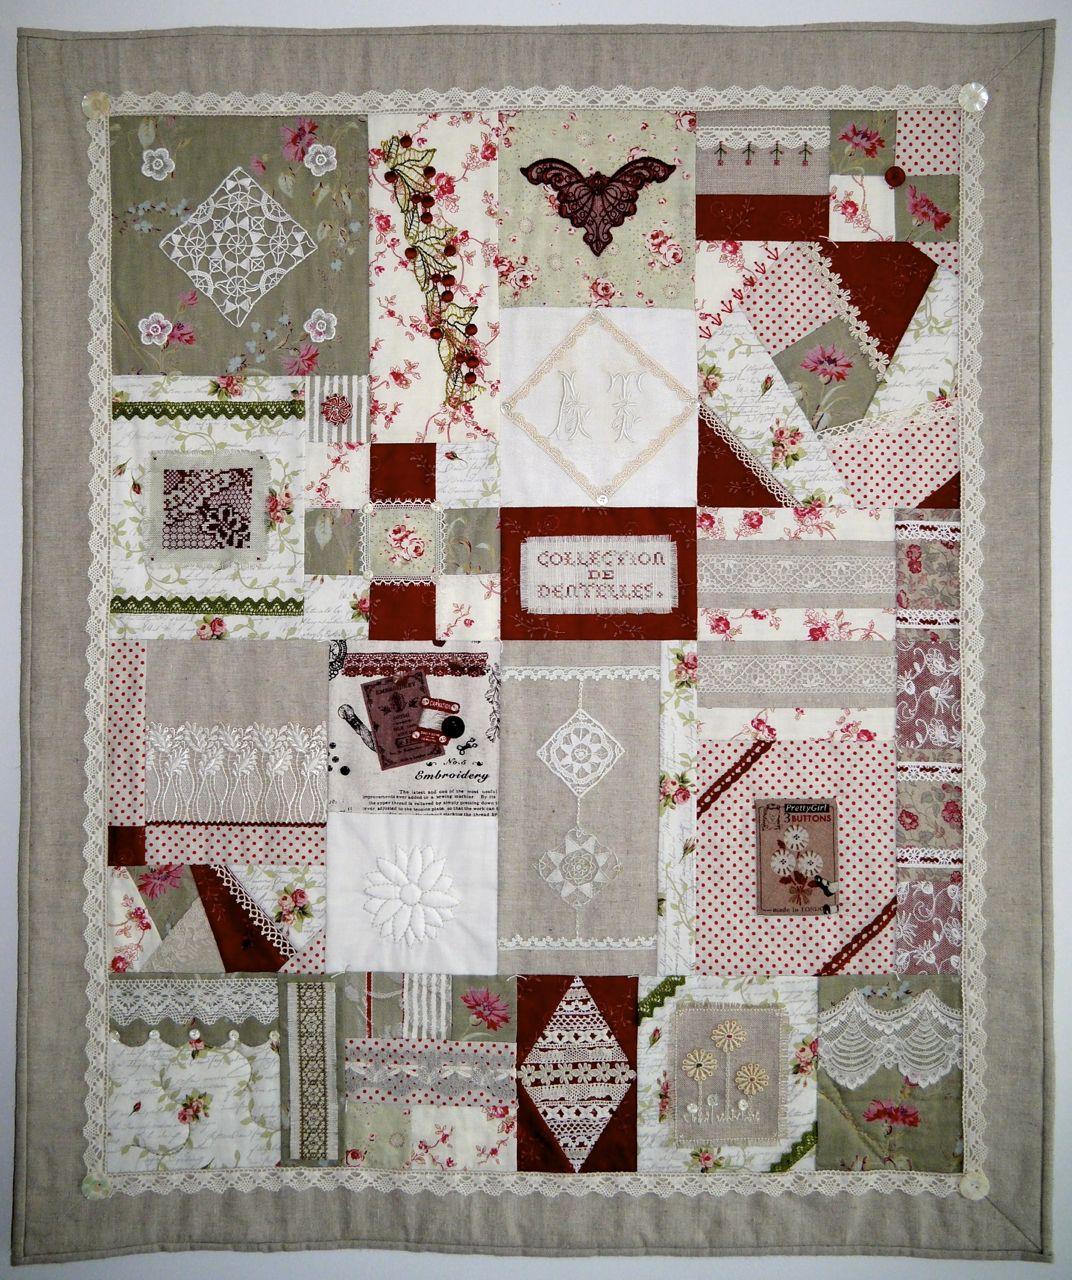 au fil d 39 emma id es patchwork et couture facile image 38. Black Bedroom Furniture Sets. Home Design Ideas